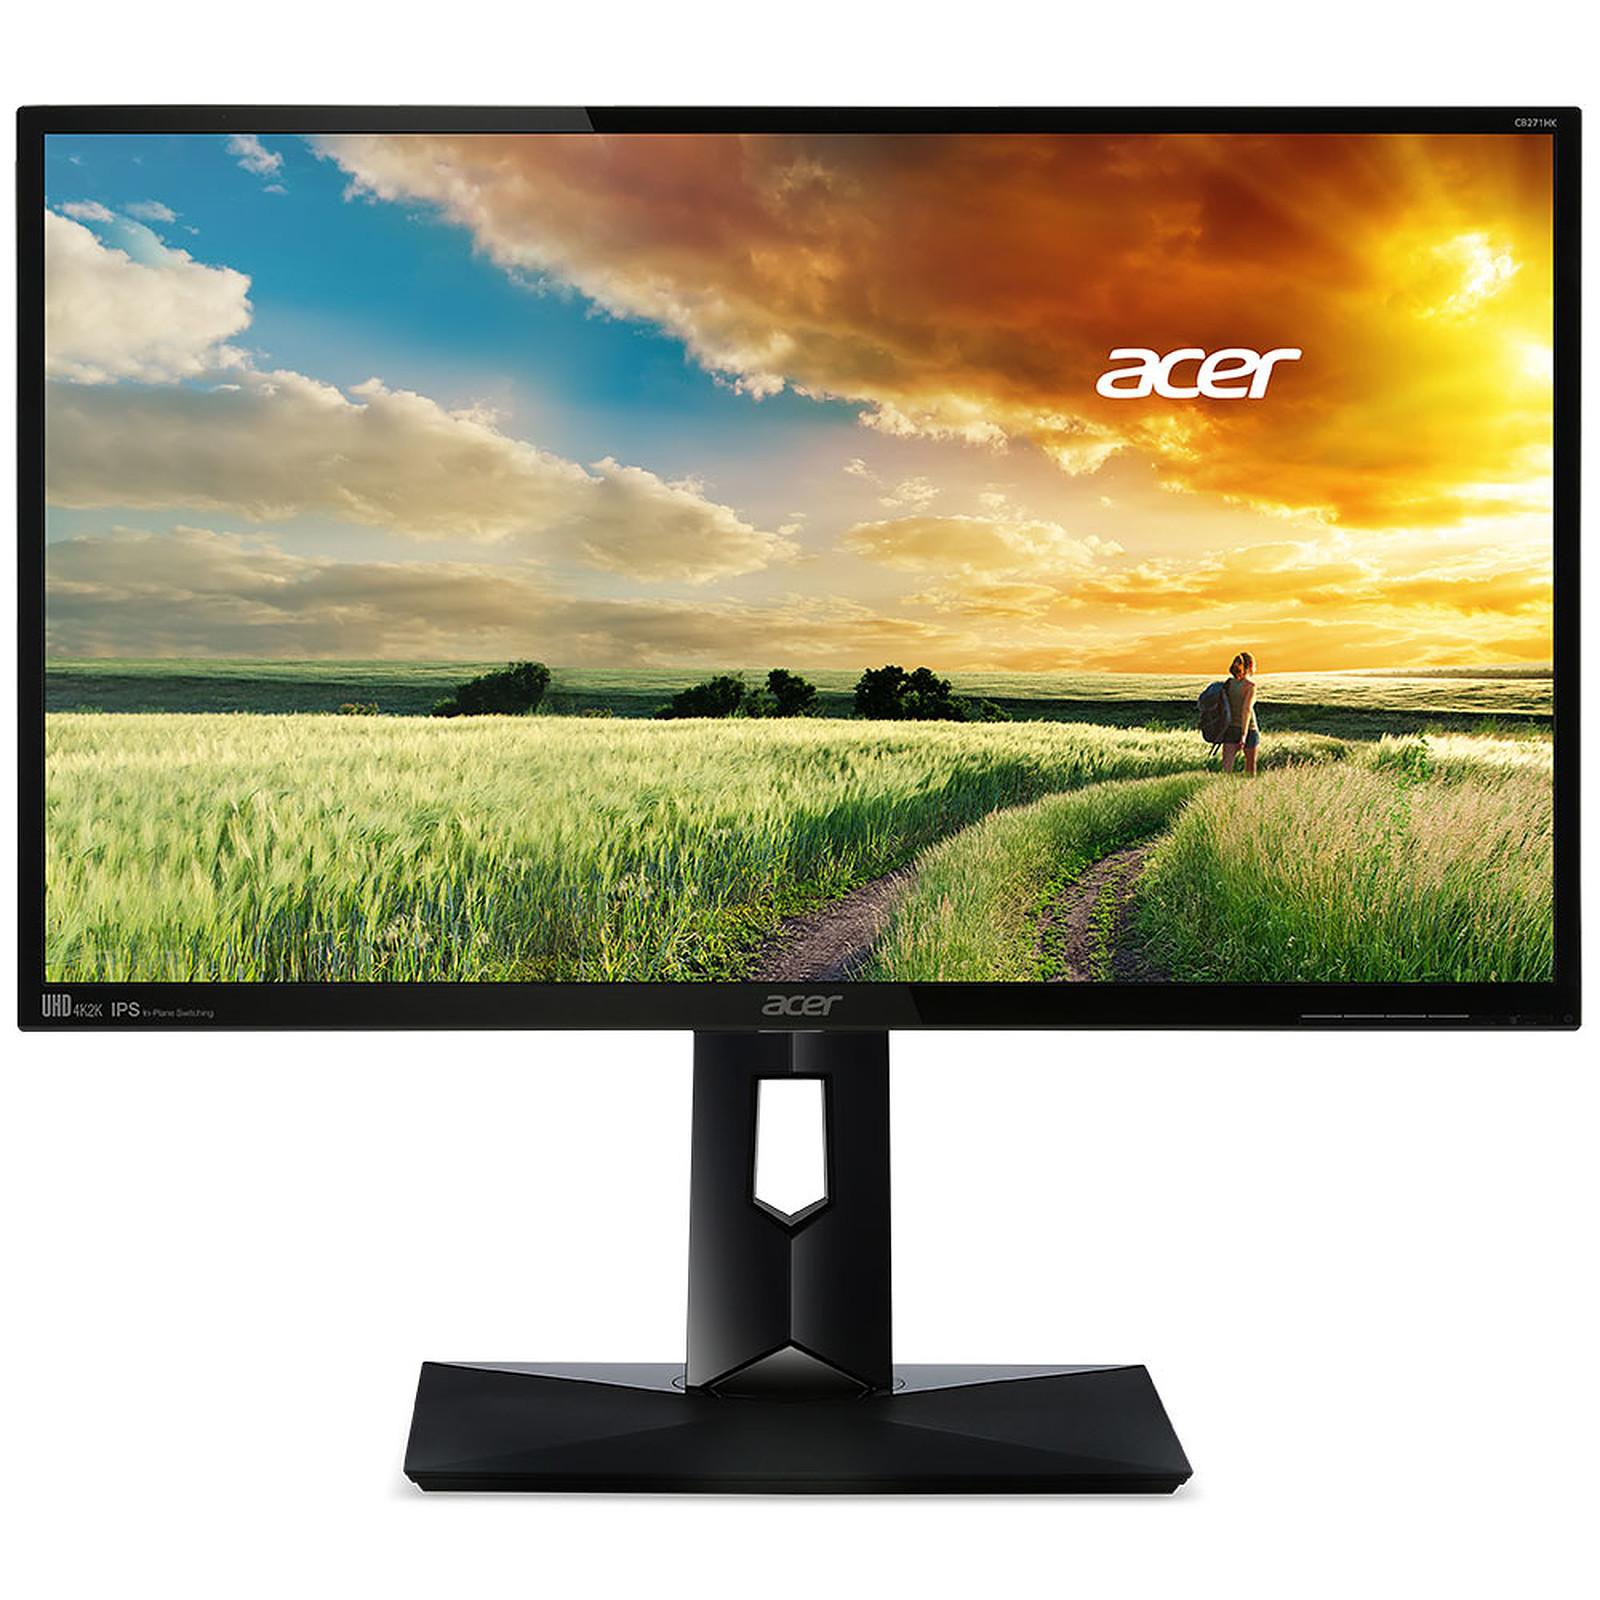 "Acer 27"" LED - CB271HUbmidprx"